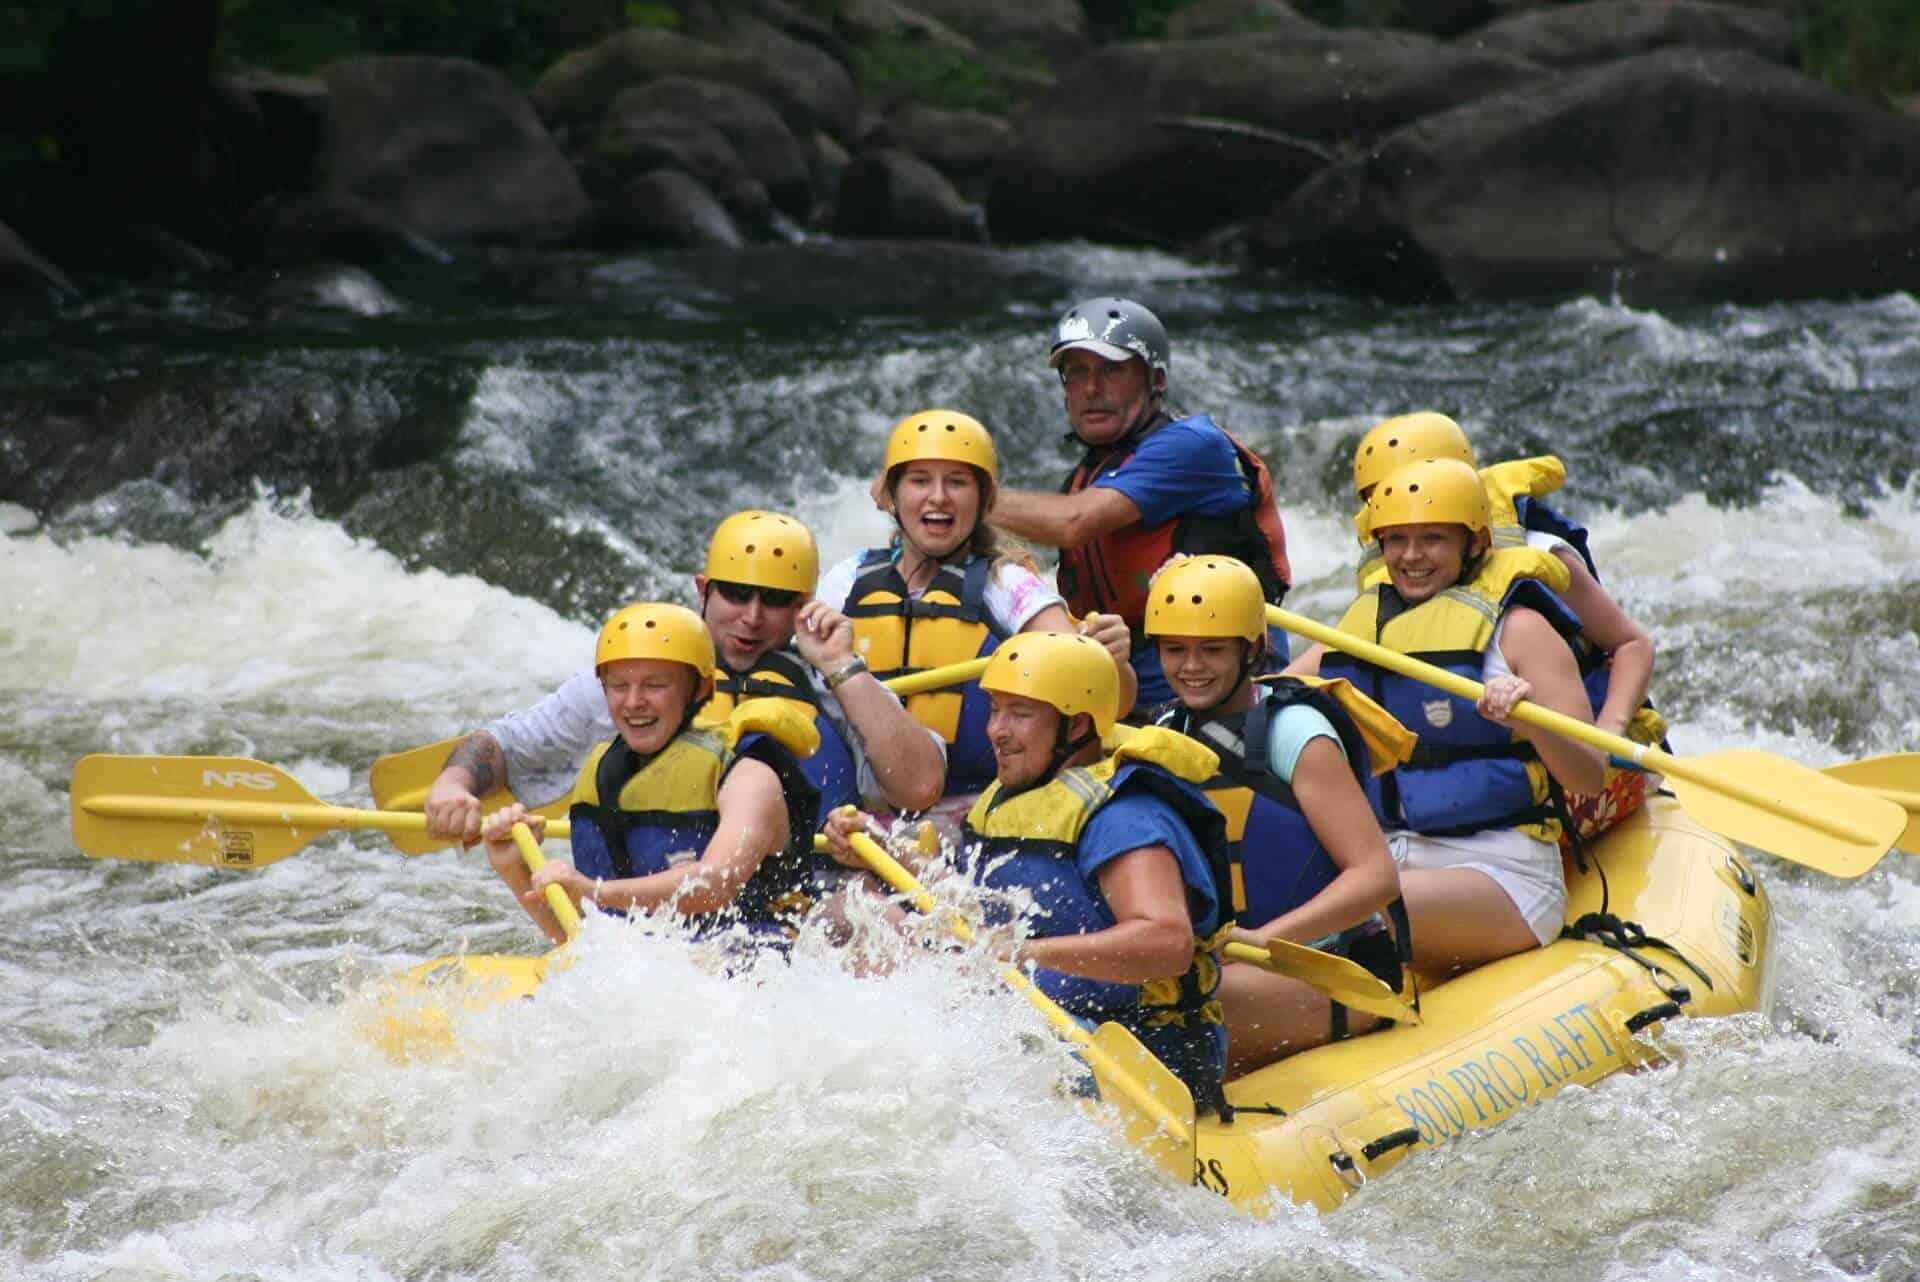 Dag 6. Rafting op de Adige Rivier